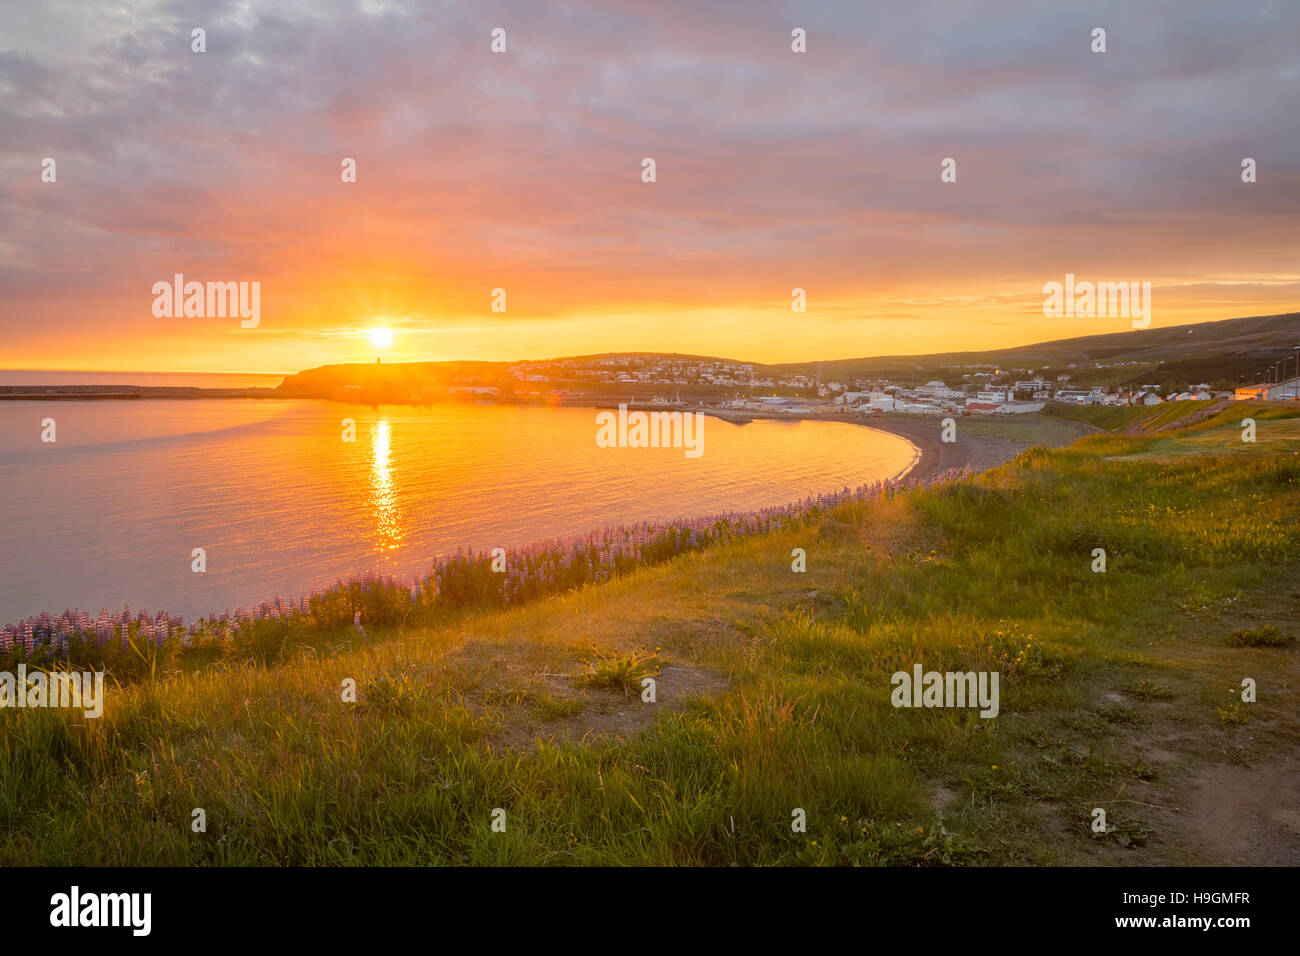 Sunset view of the fishing town Husavik, northeast Iceland - Stock Image